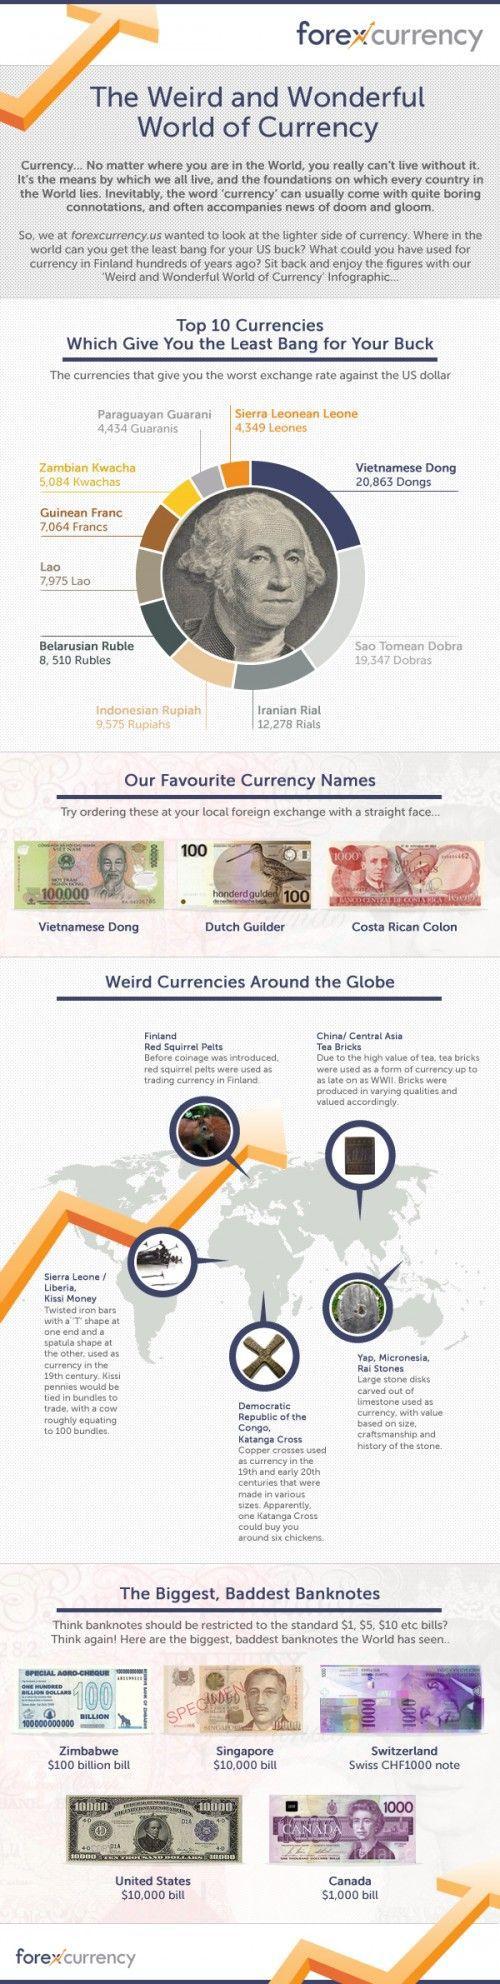 Swift merchant cash advance image 2